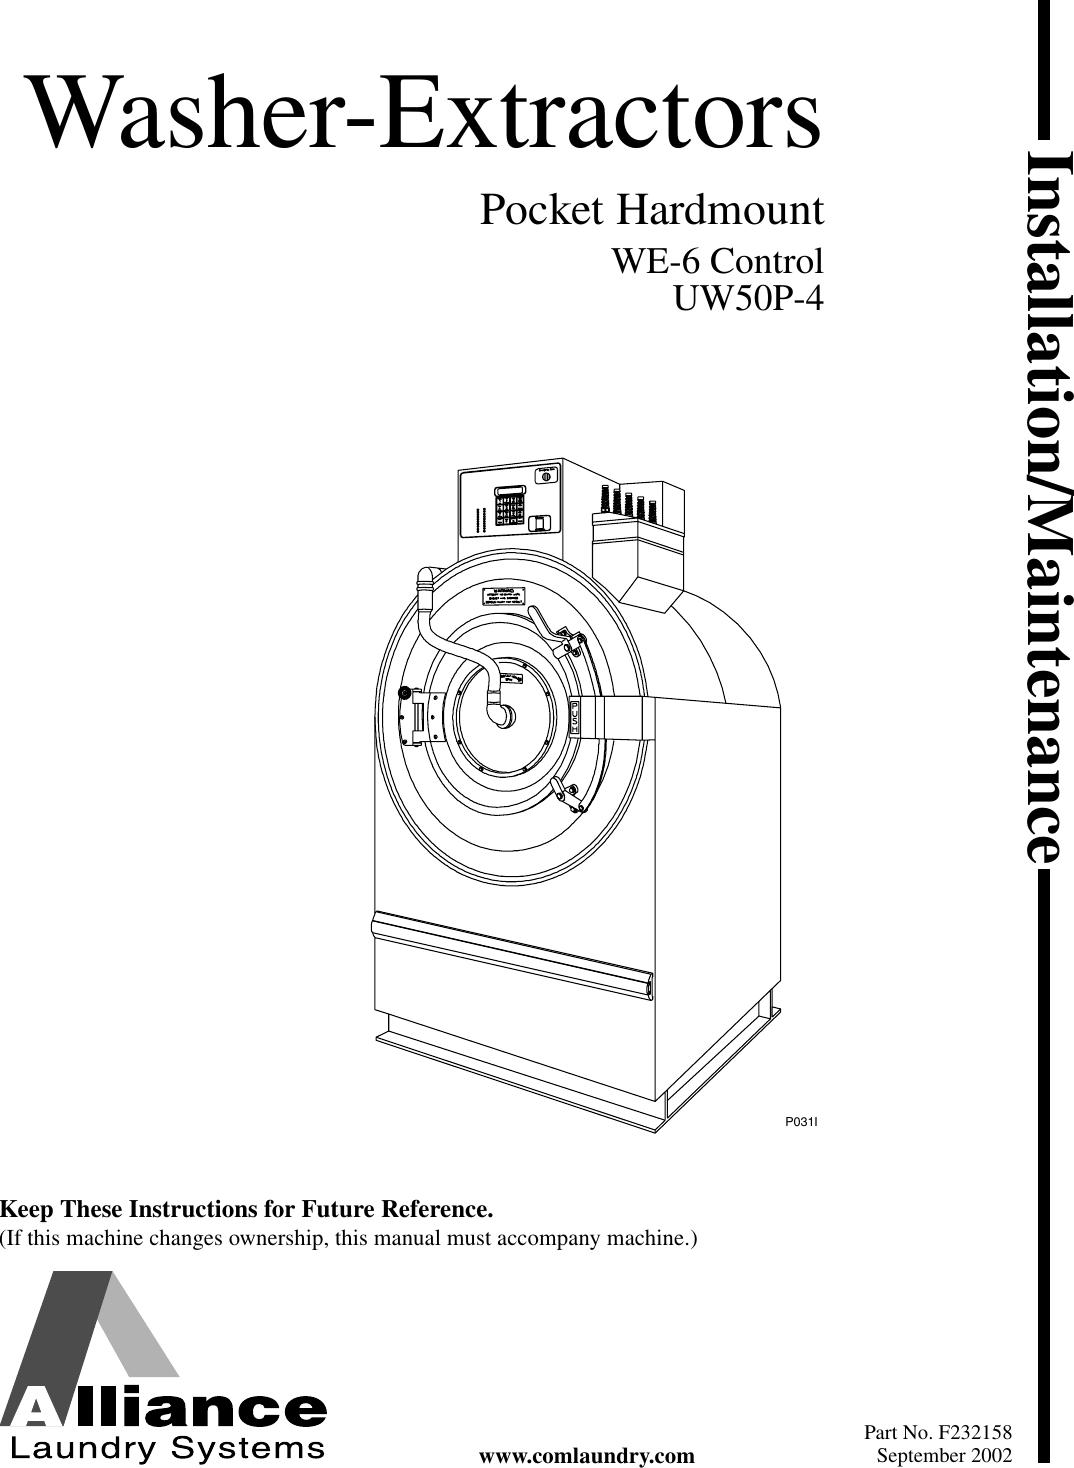 Alliance Laundry Systems Uw50p 4 Users Manual Washer Extractors Washing Machine Door Interlock Wiring Diagram Installation Maintenance